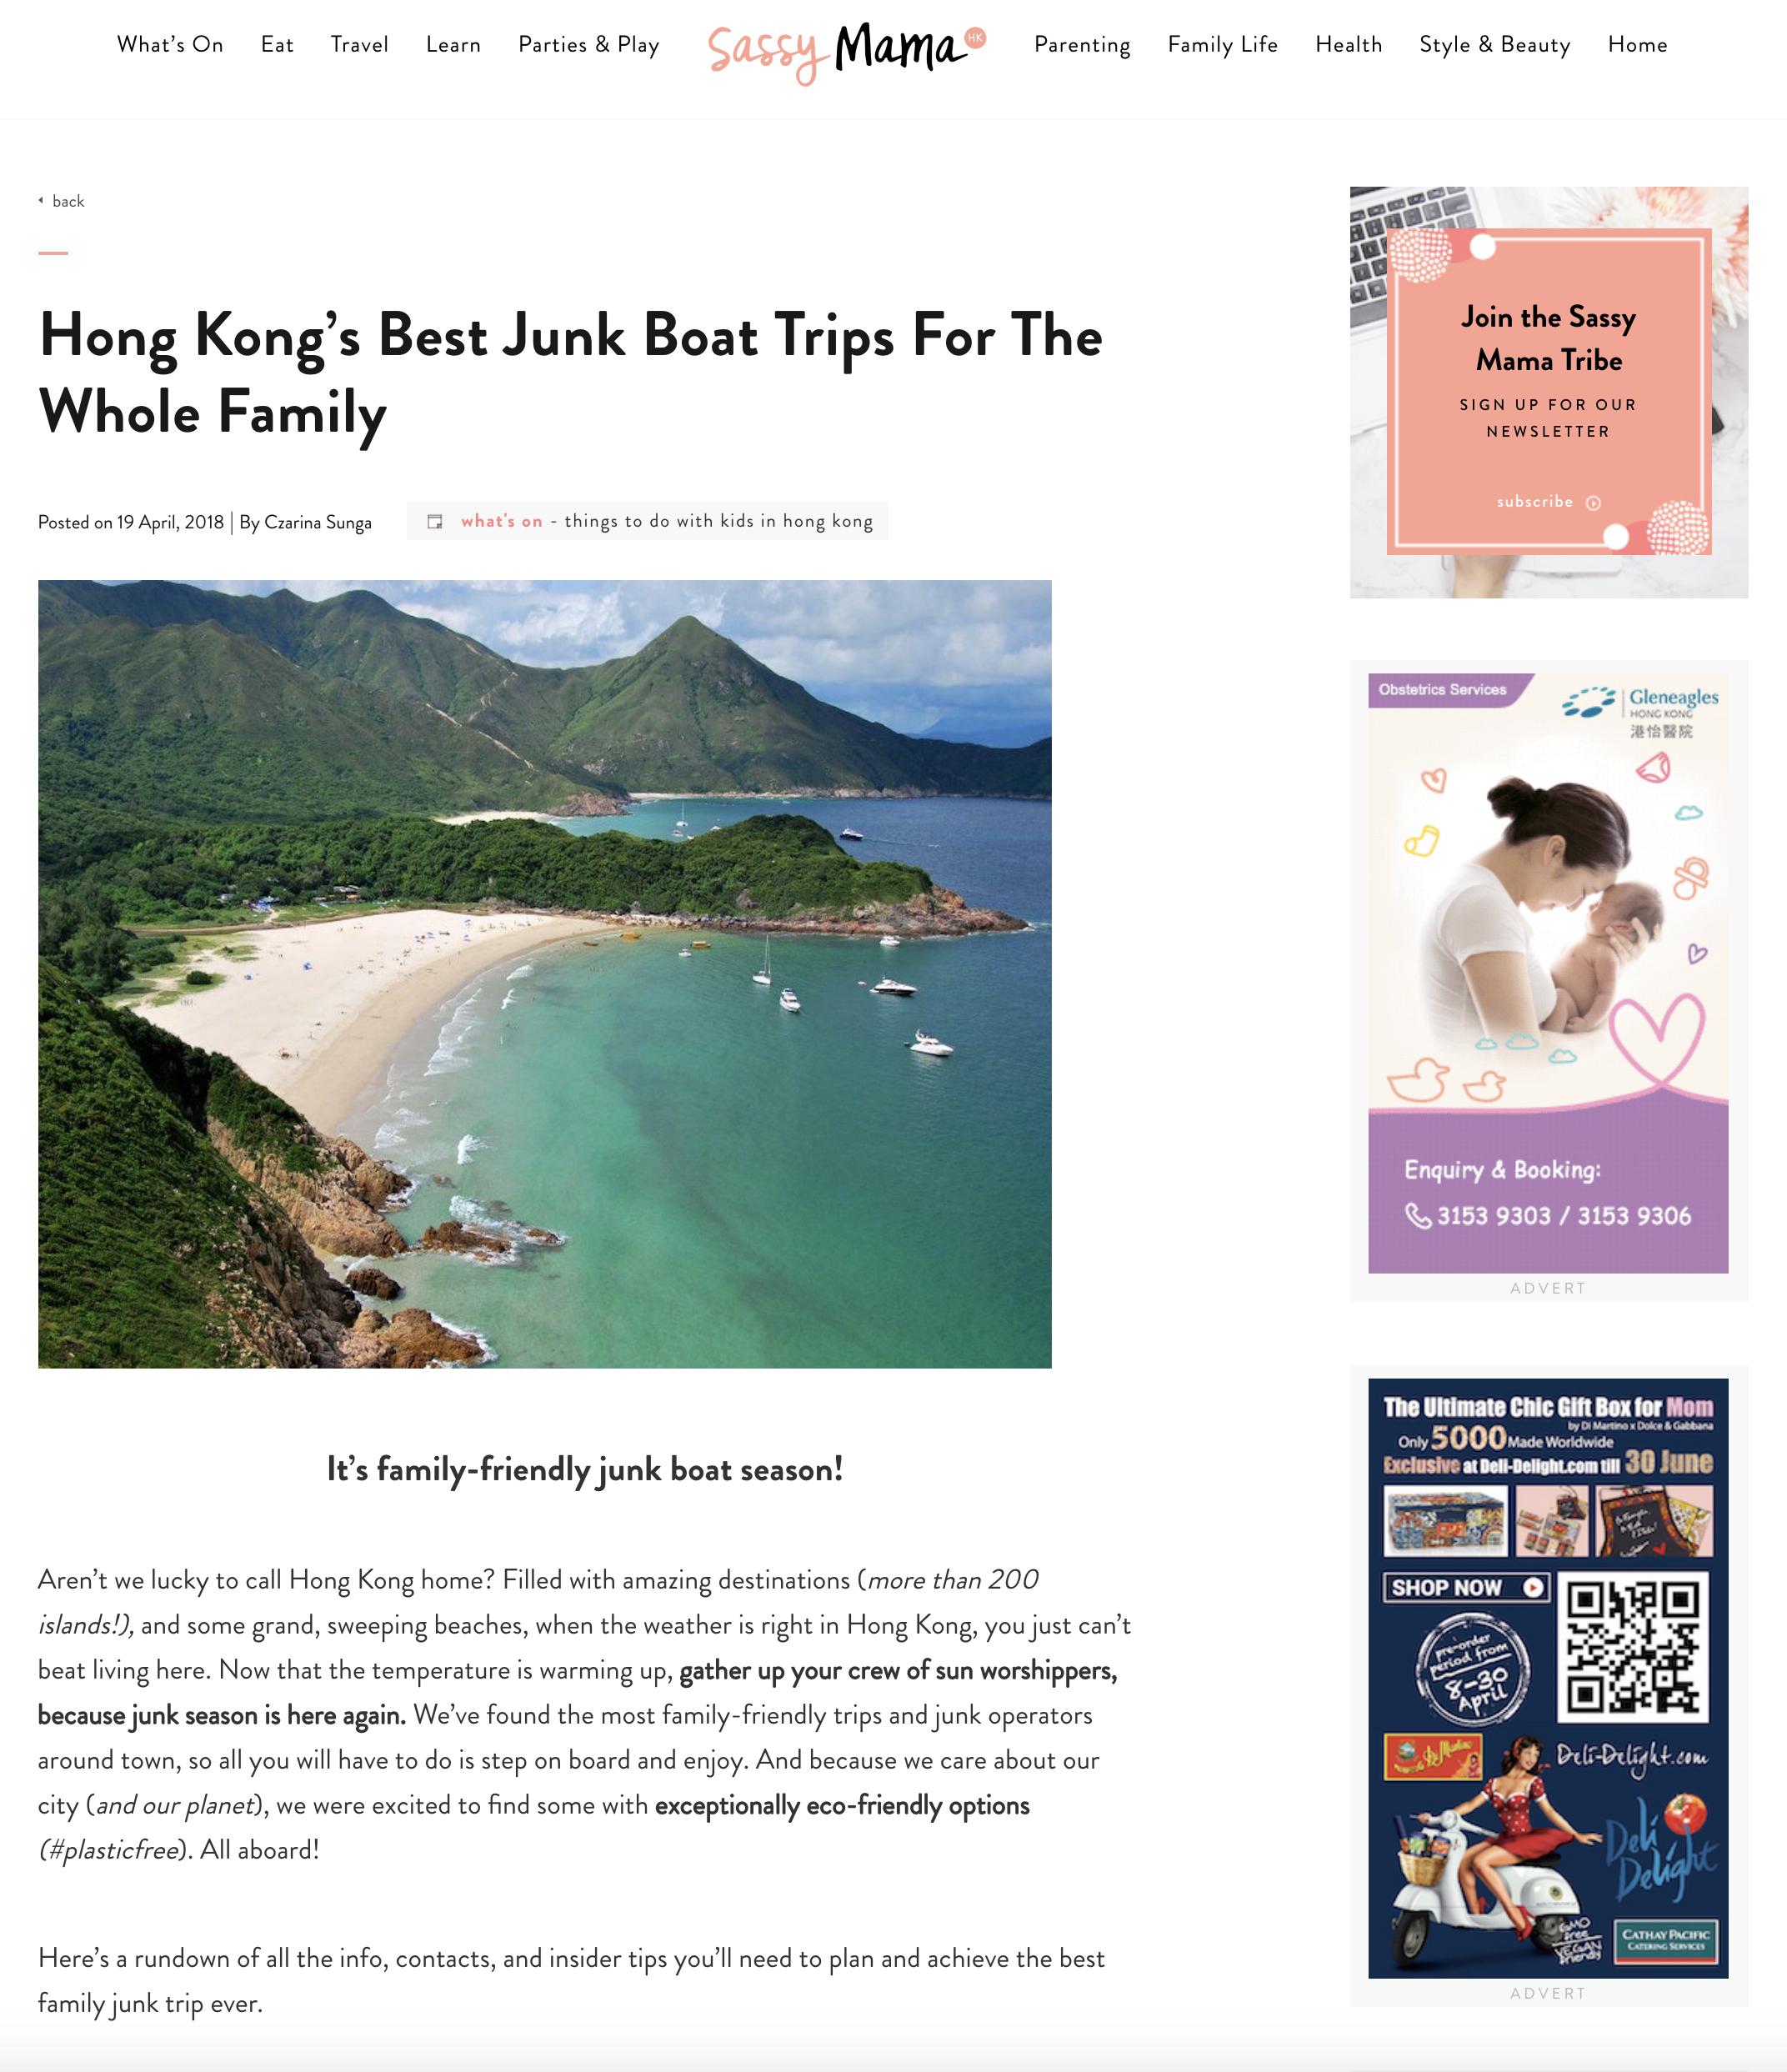 book captain ryan for your hong kong junk adventure